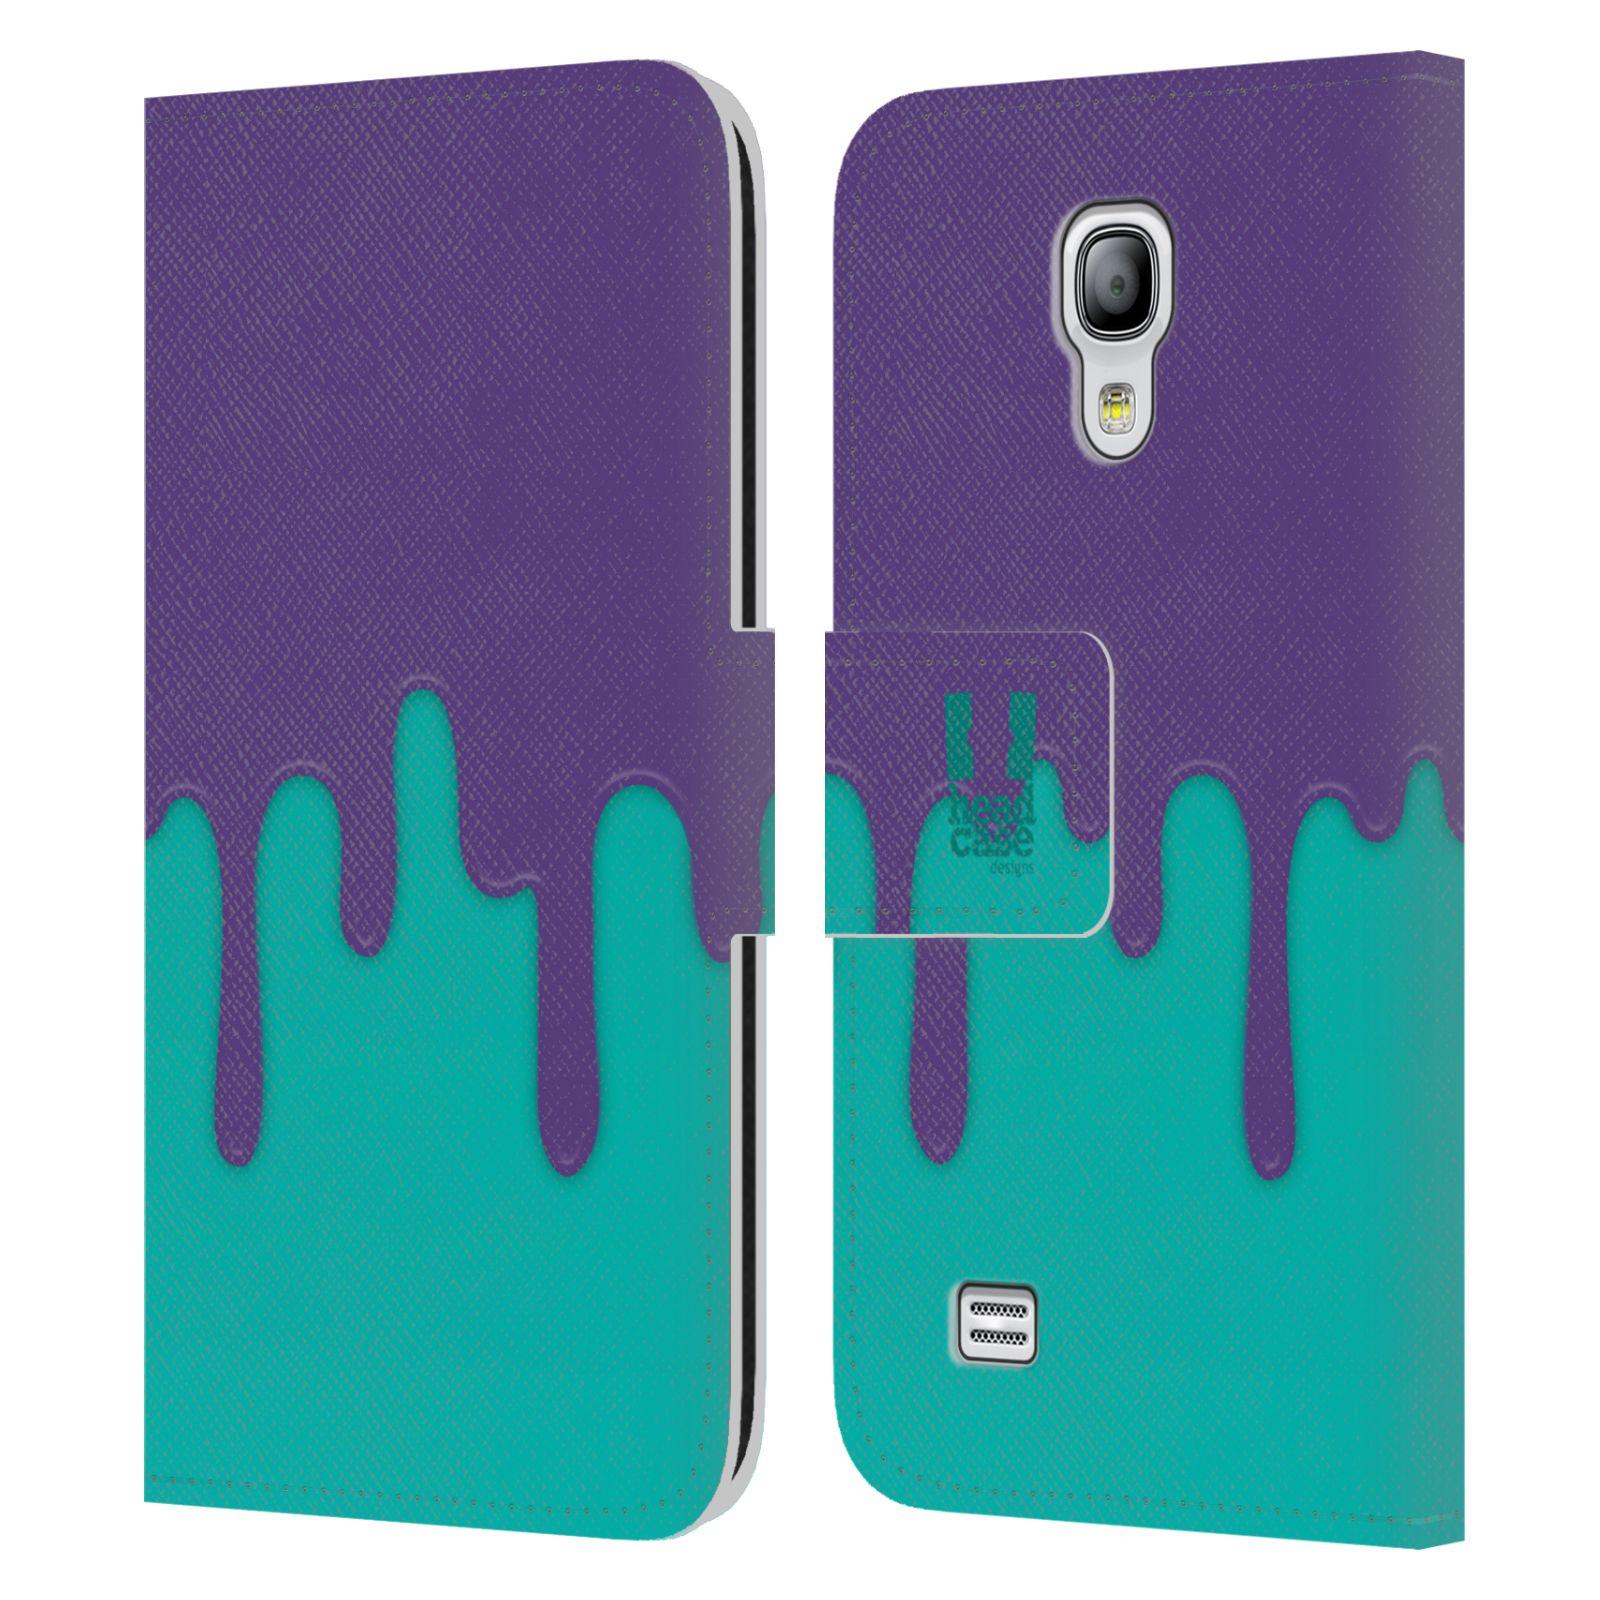 HEAD CASE Flipové pouzdro pro mobil Samsung Galaxy S4 MINI / S4 MINI DUOS Rozlitá barva fialová a tyrkysová